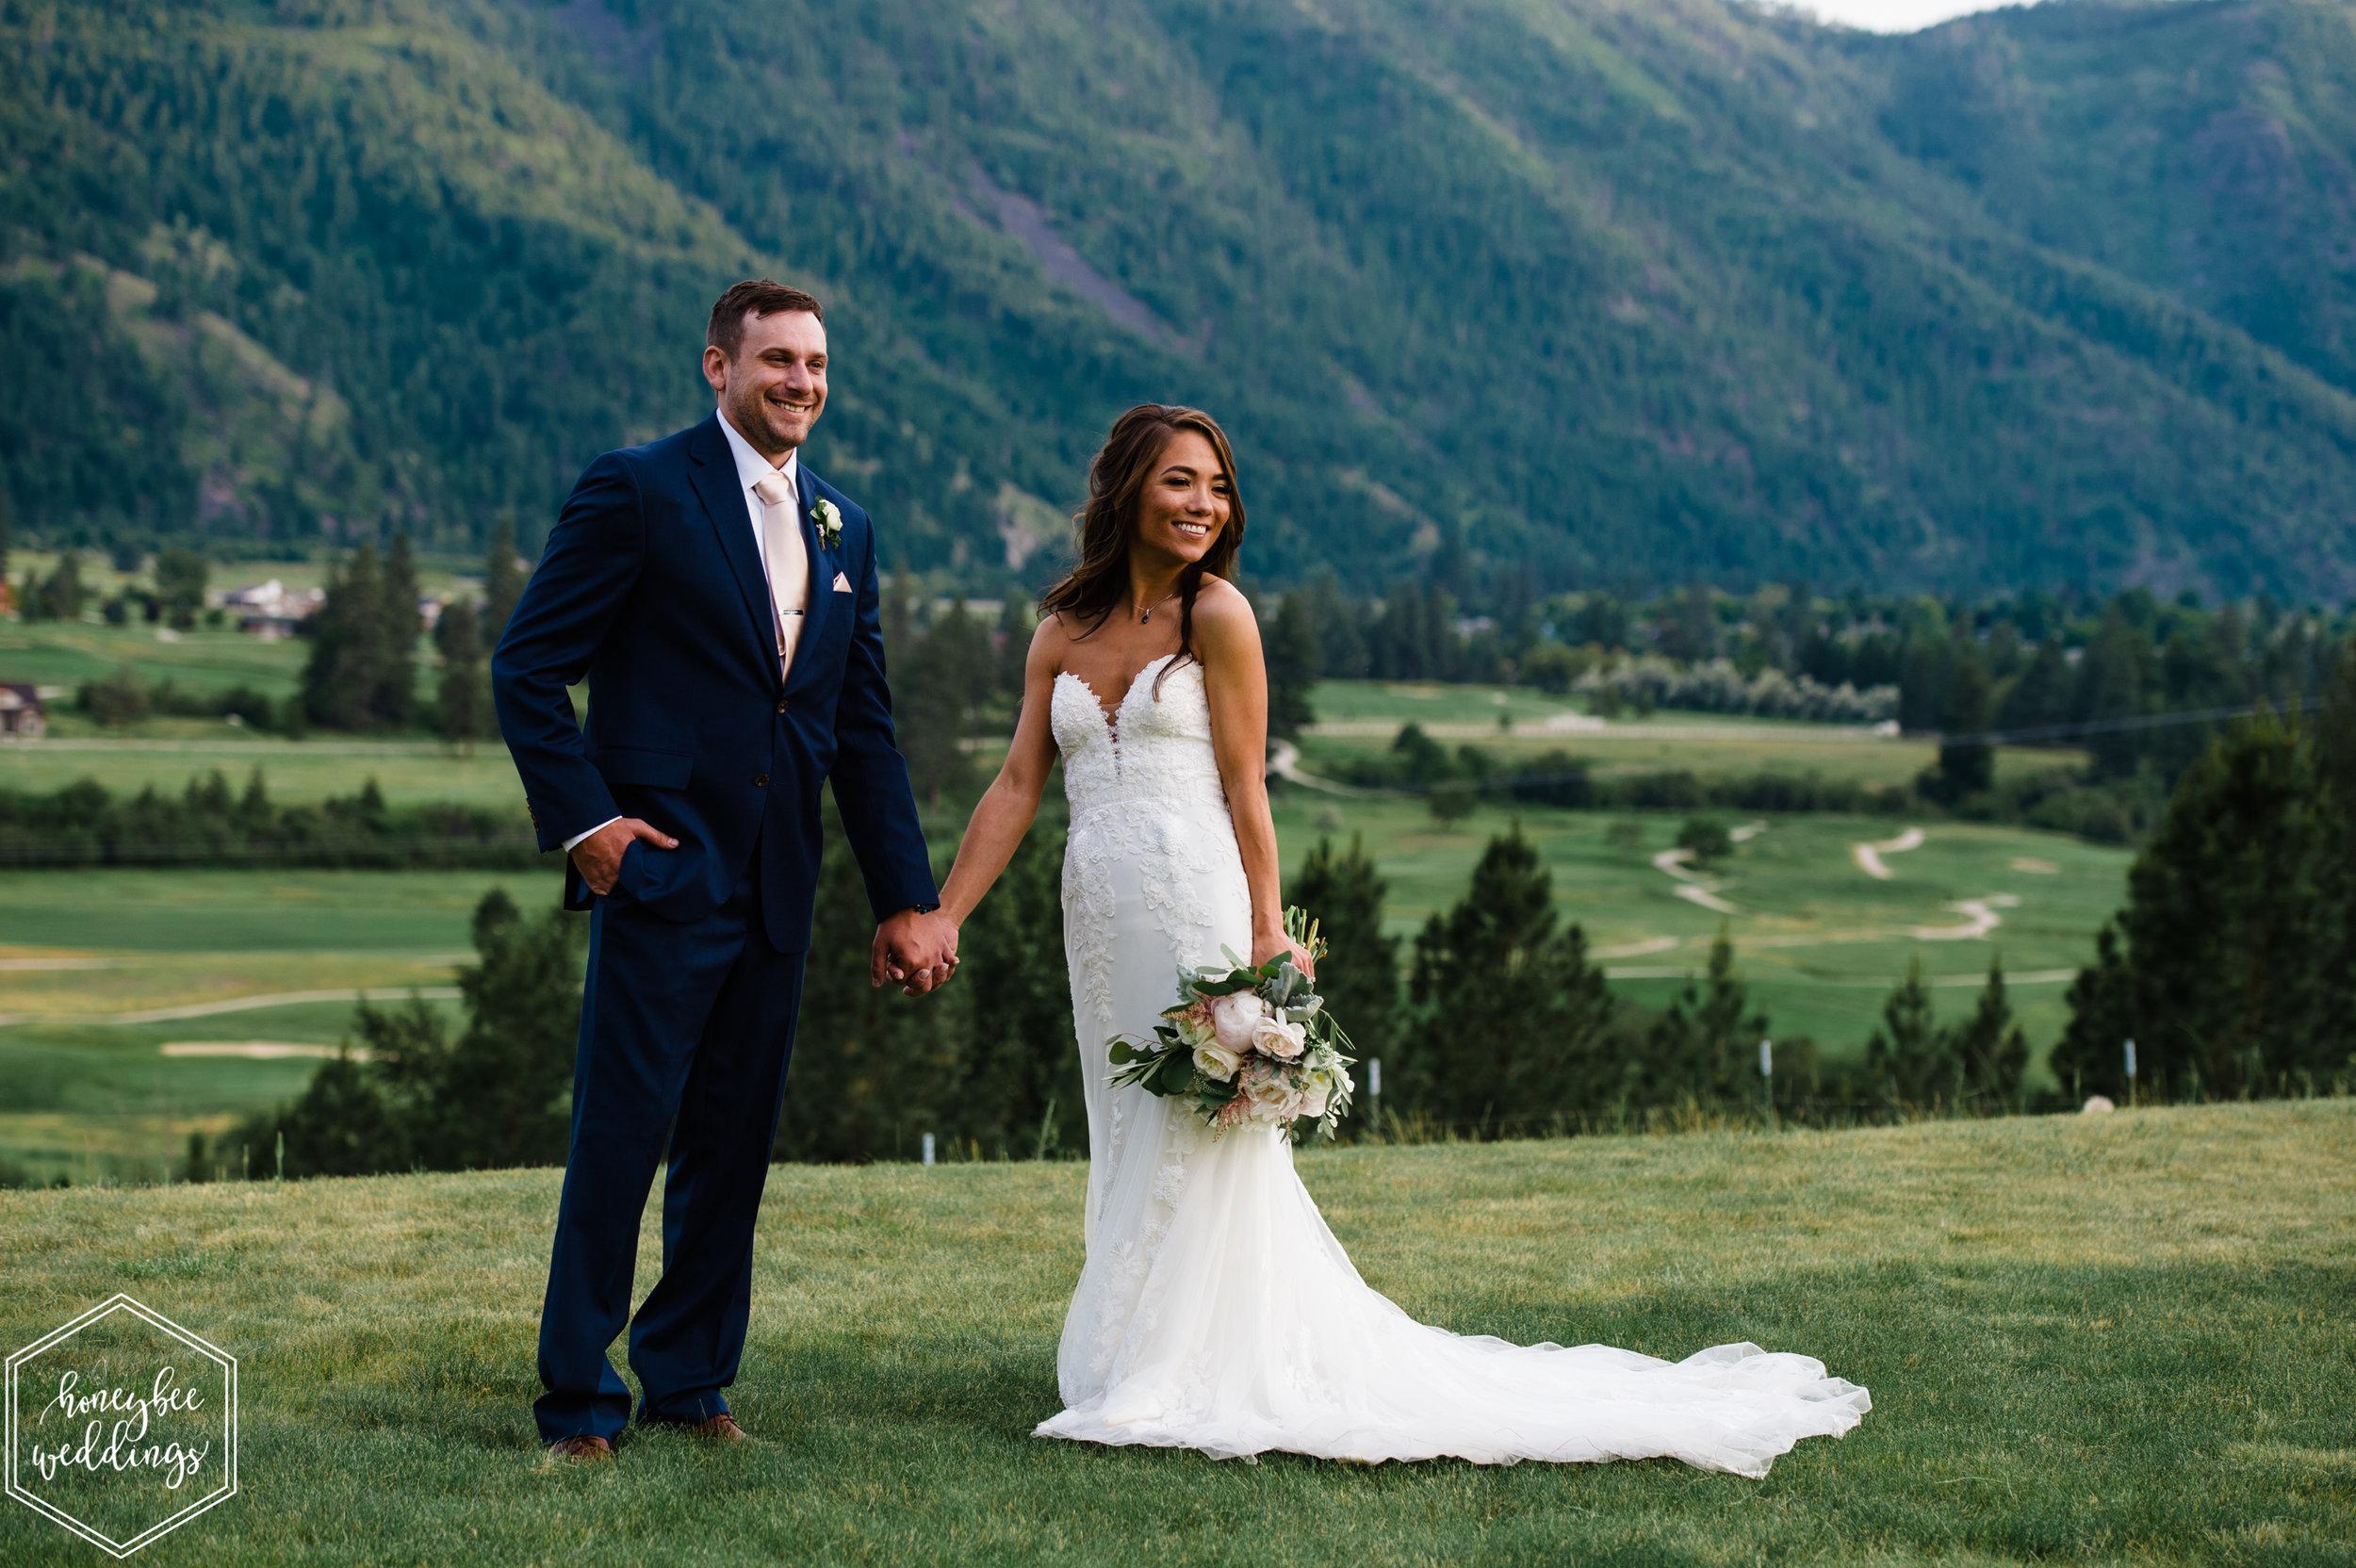 367Montana Wedding Photographer_Missoula Wedding_Honeybee Weddings_Devlin & Jacob_June 22, 2019-1165.jpg